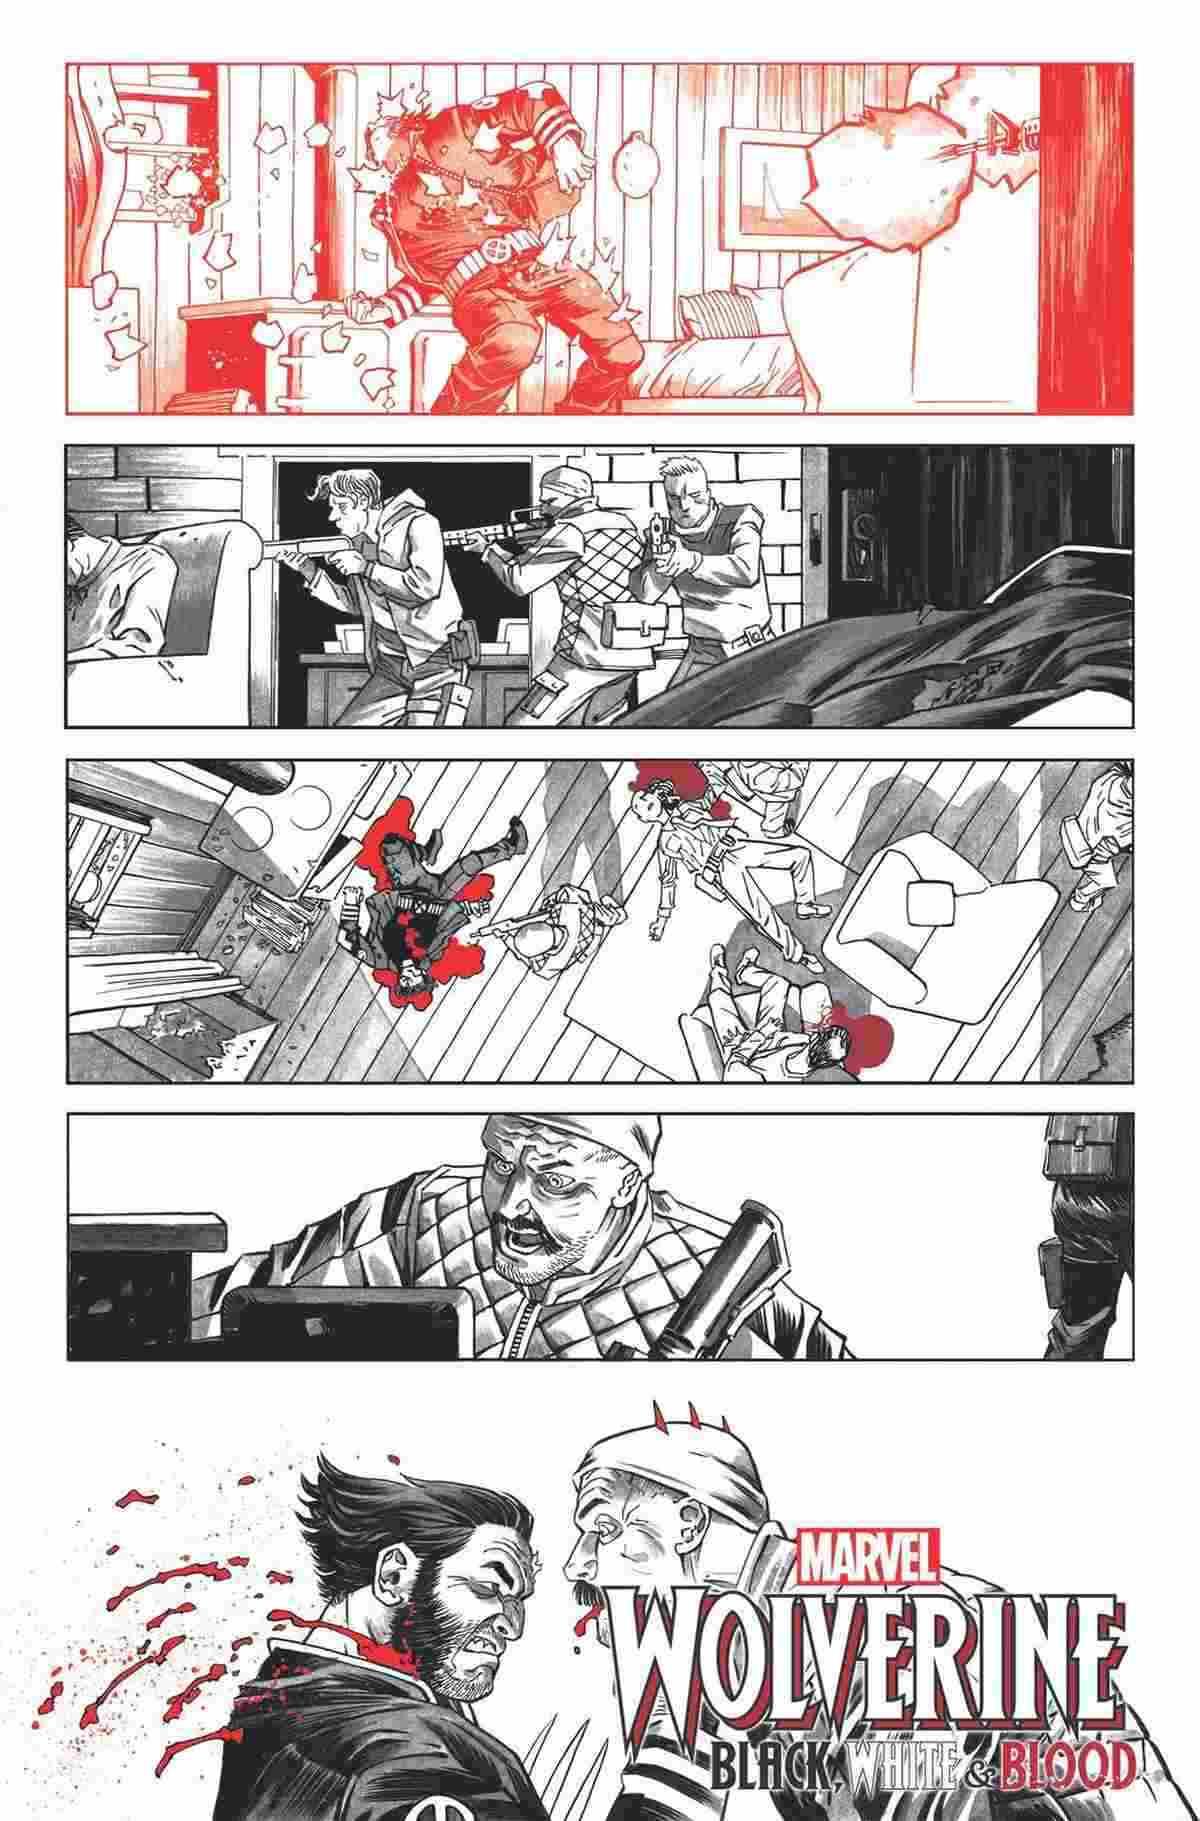 Wolverine BlackWhite and Blood 005